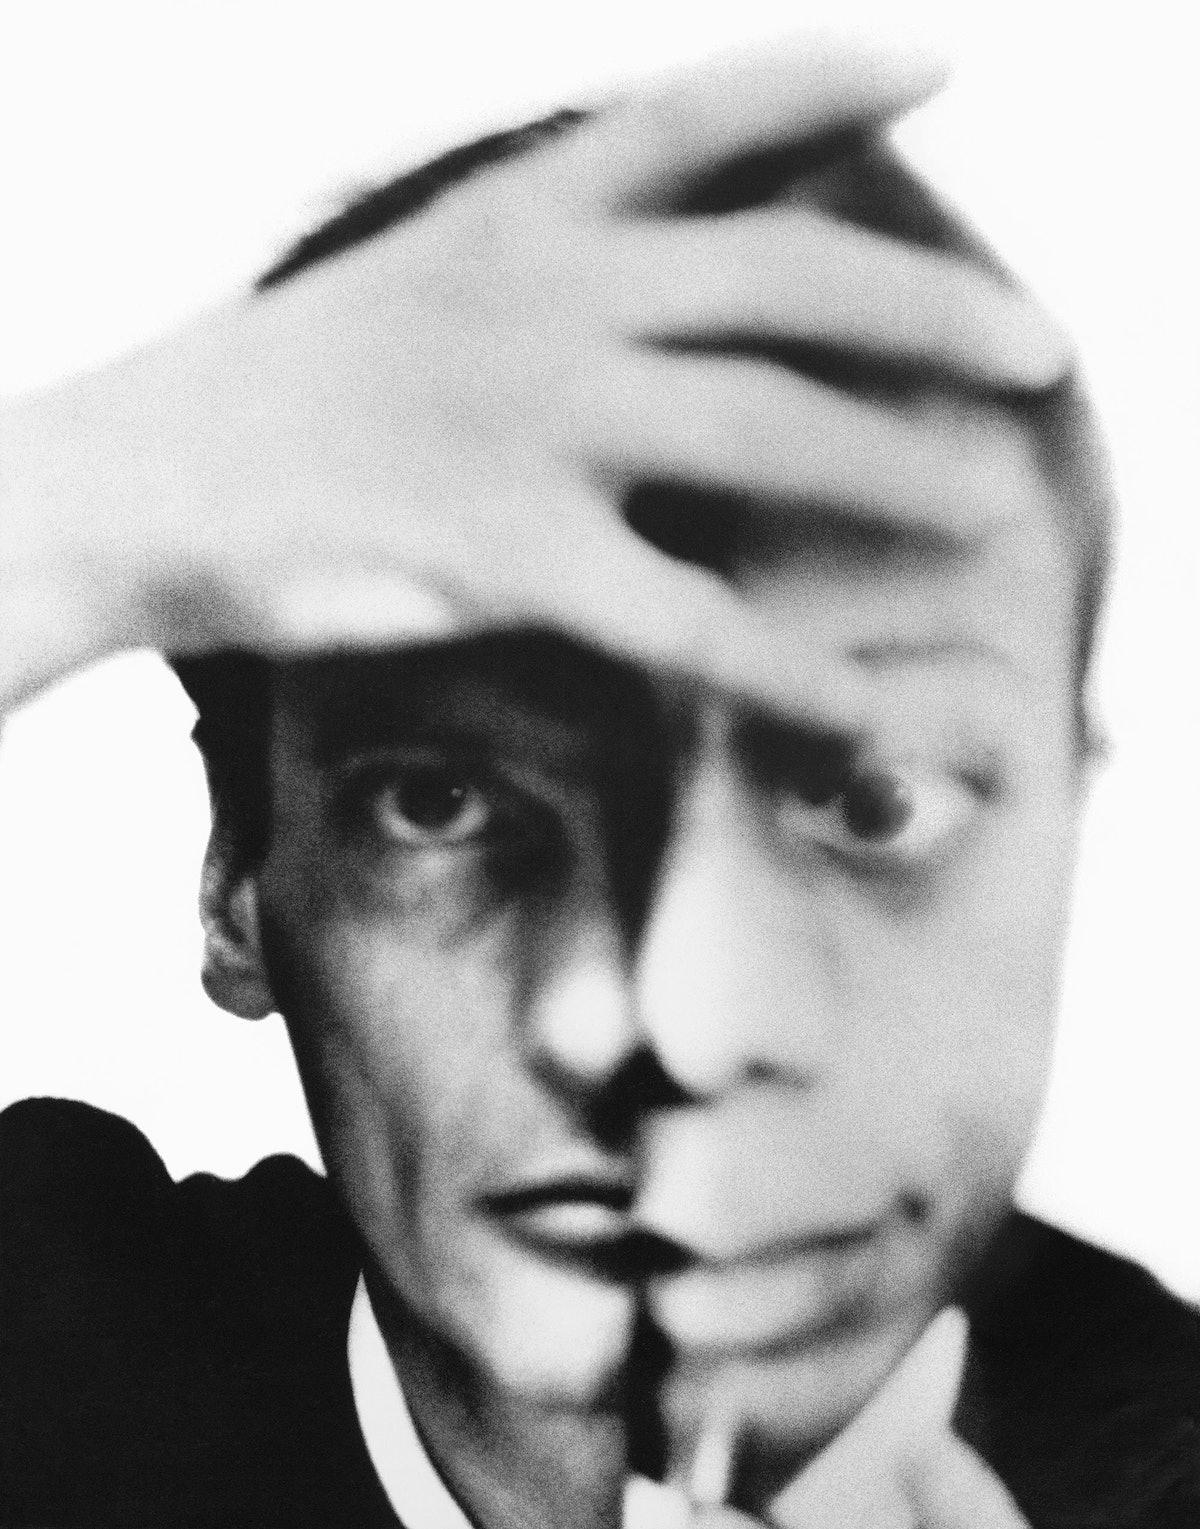 Photomat self-portrait with James Baldwin, New York City, September 17, 1964